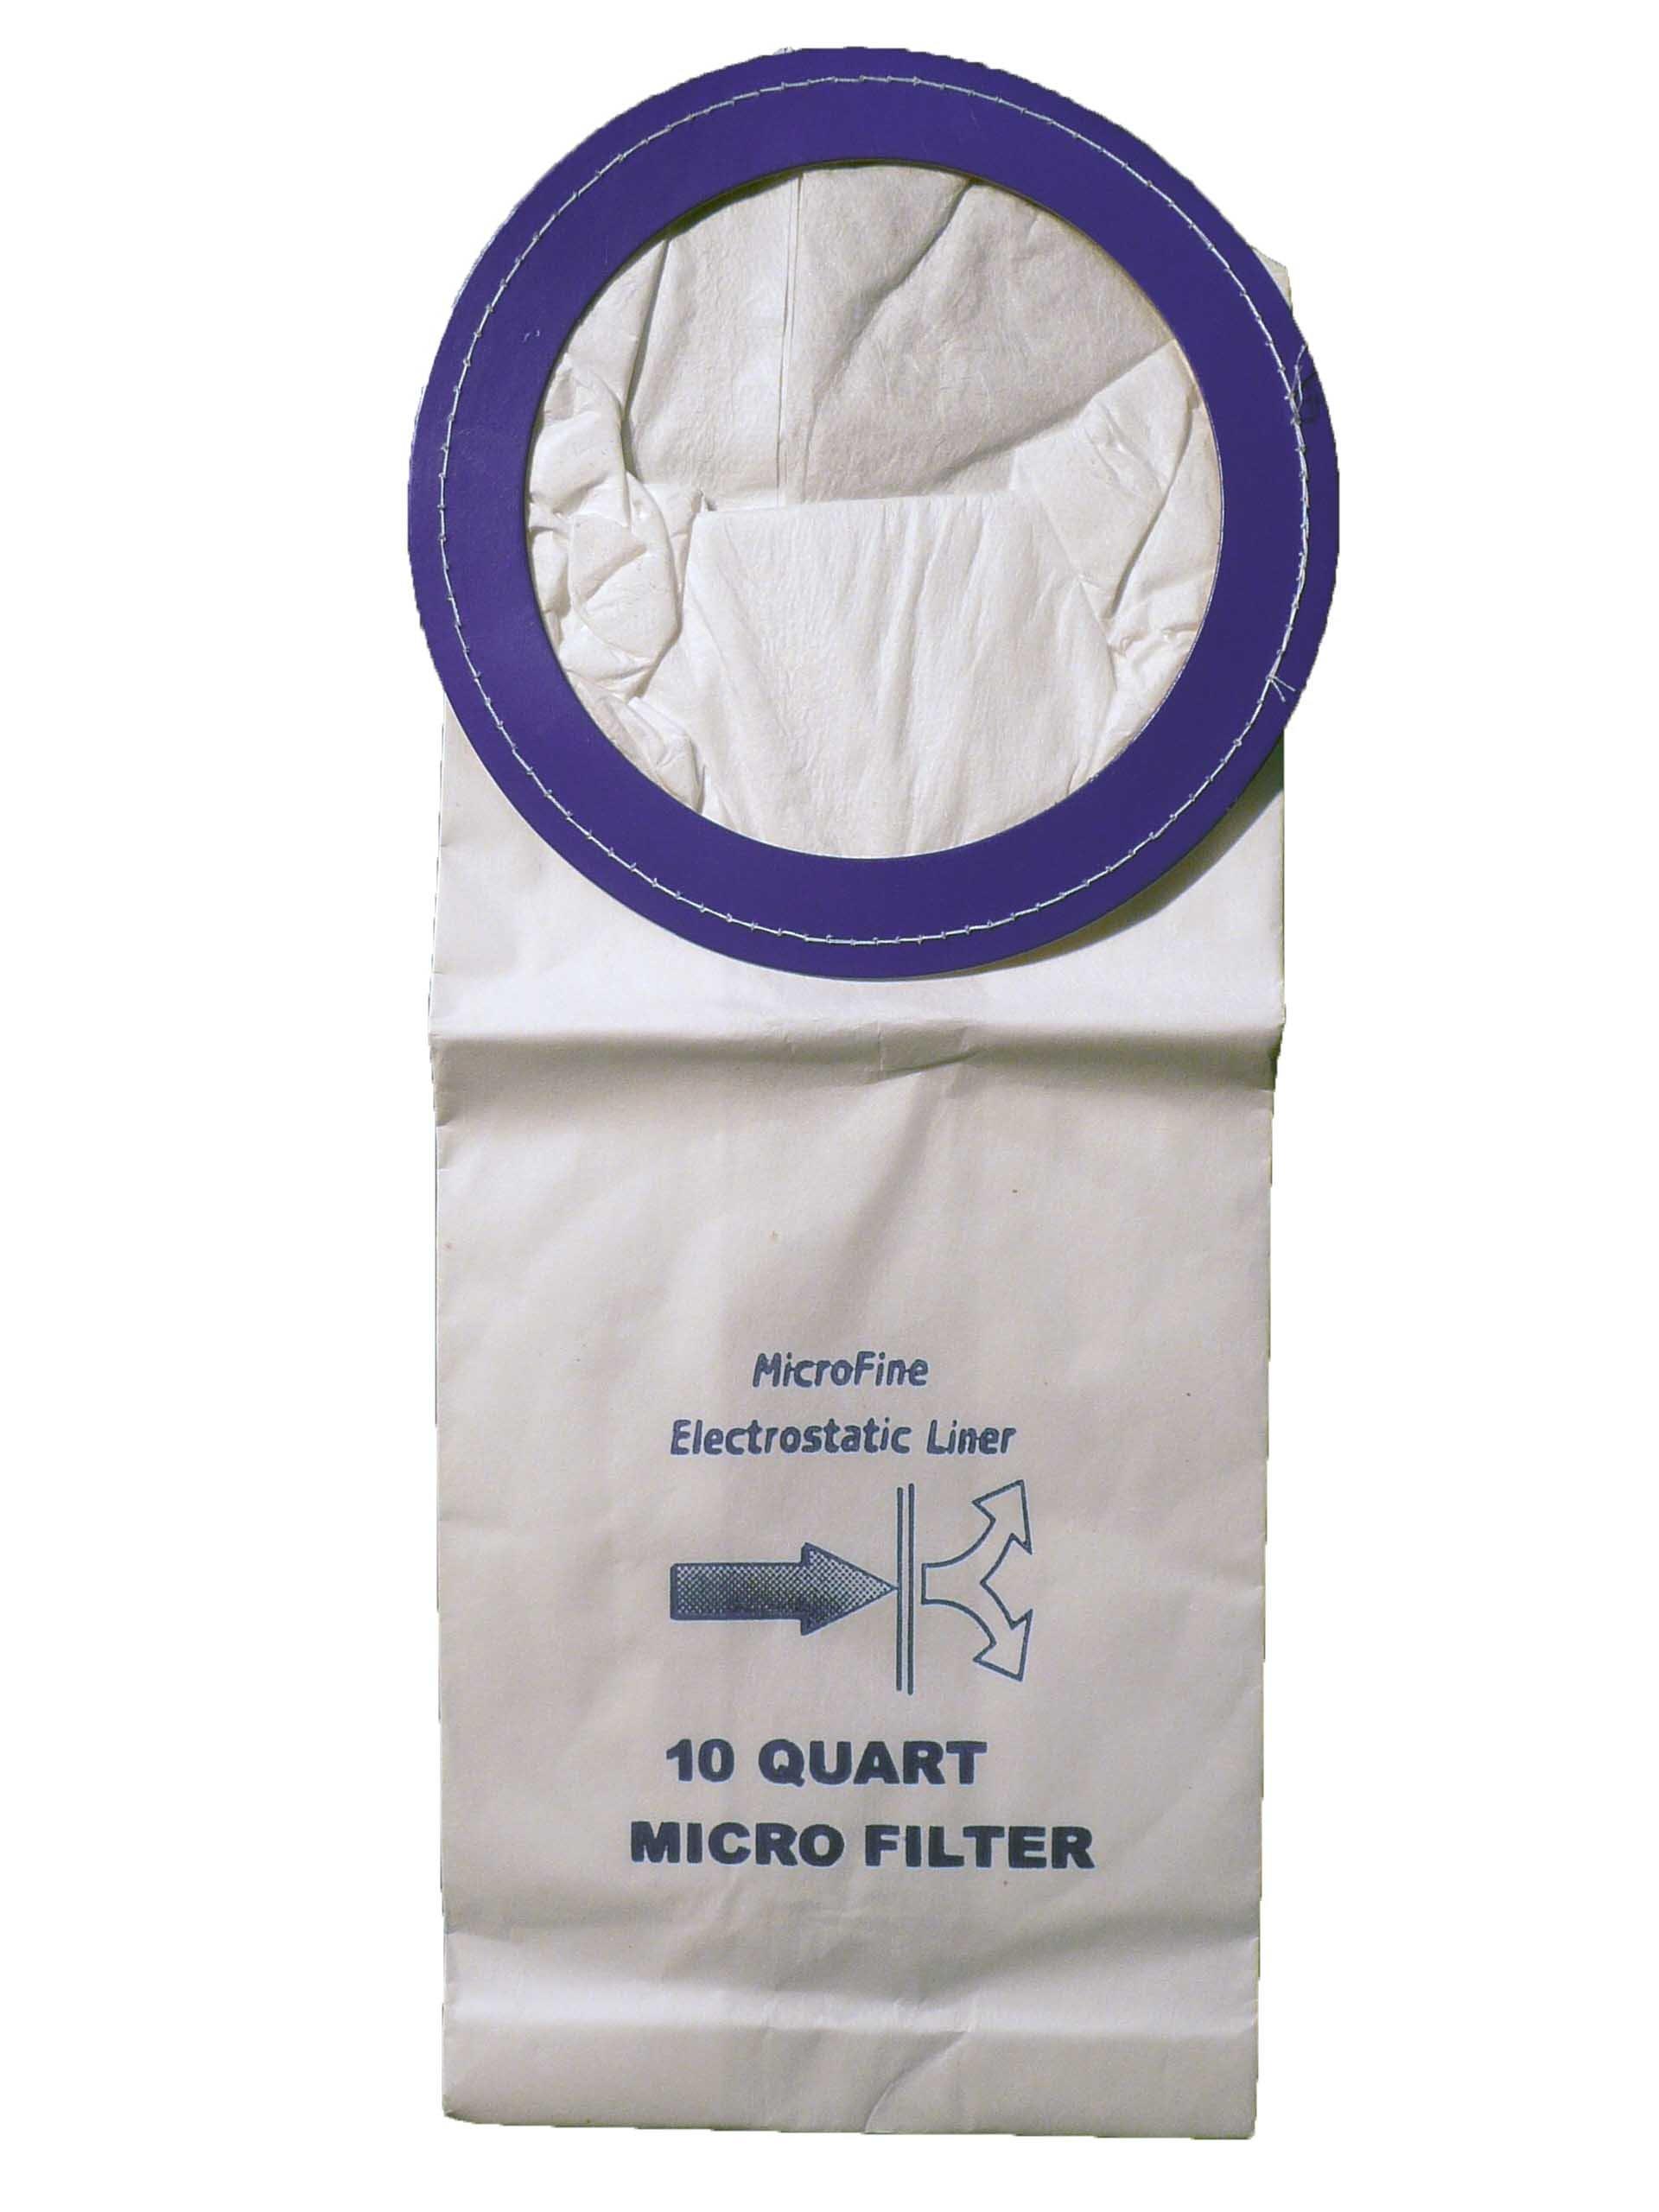 10 Commercial Backpack Vacuum Cleaner Bags 10 Quart, Clarke, Coach, Sandia, Windsor, Proteam, Raven, Perfect, EDIC, Windsor # 86198850 and 68005, Clarke 147109750, Proteam 100331, 450243, Sandia # 10-0006, Oreck OR1001,